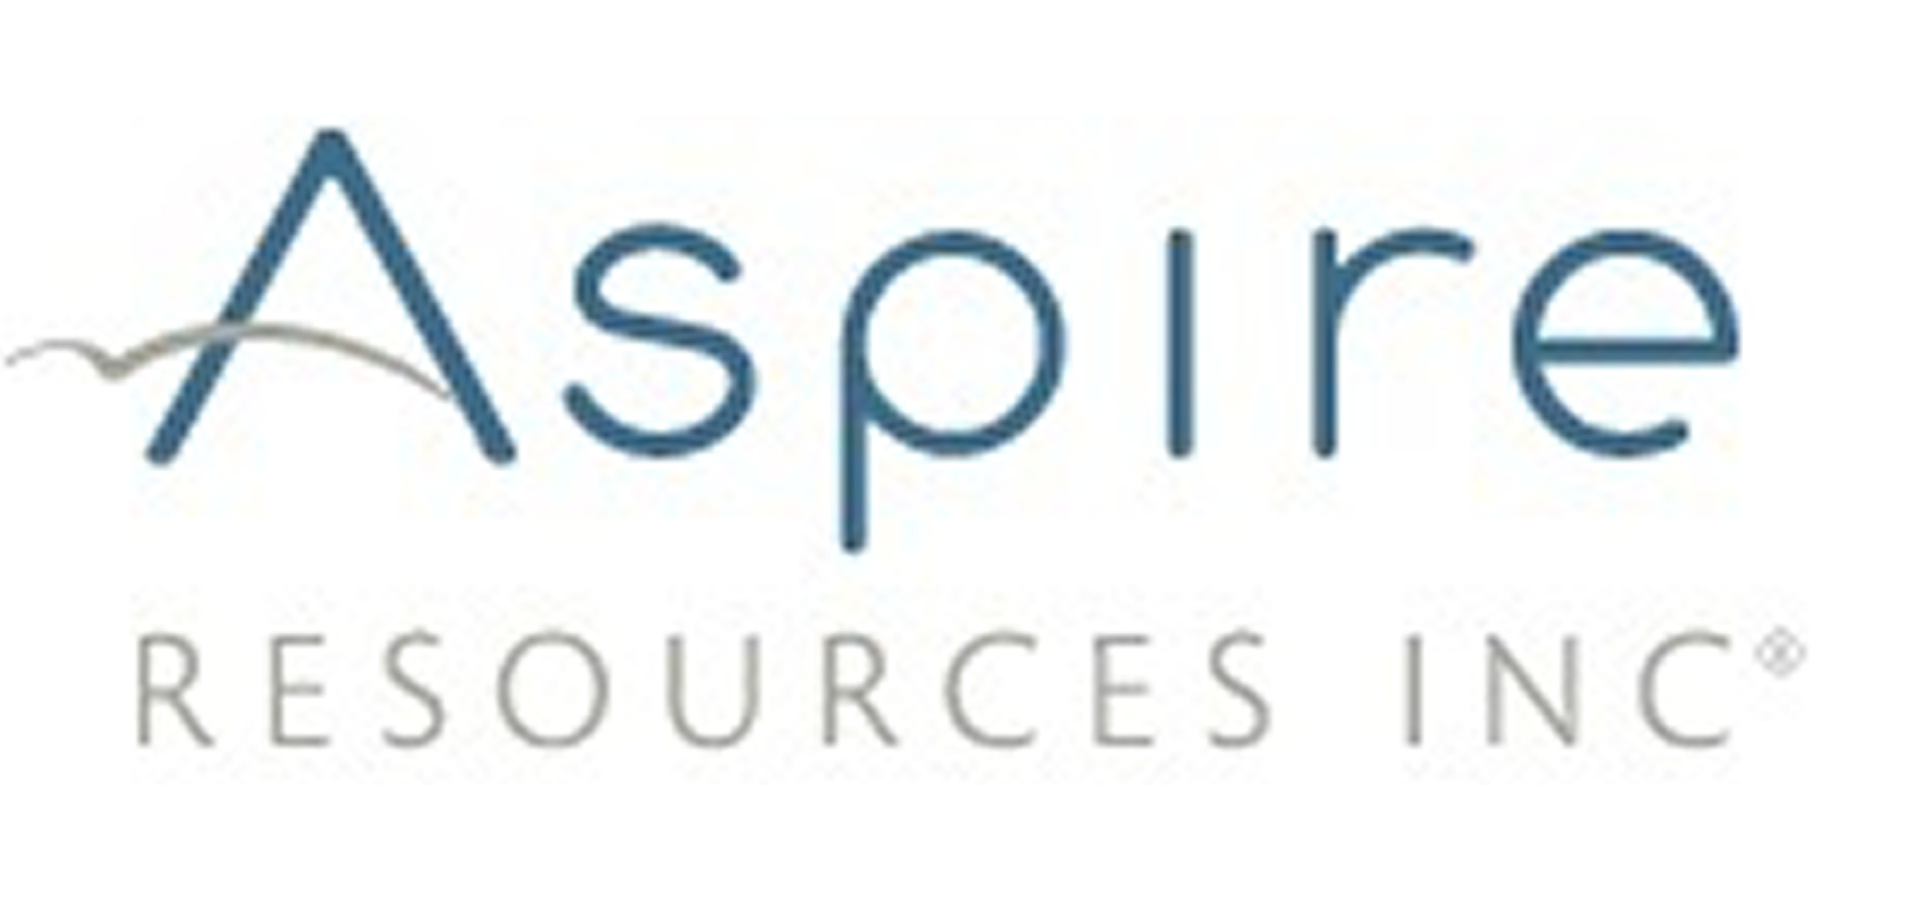 aspire-new